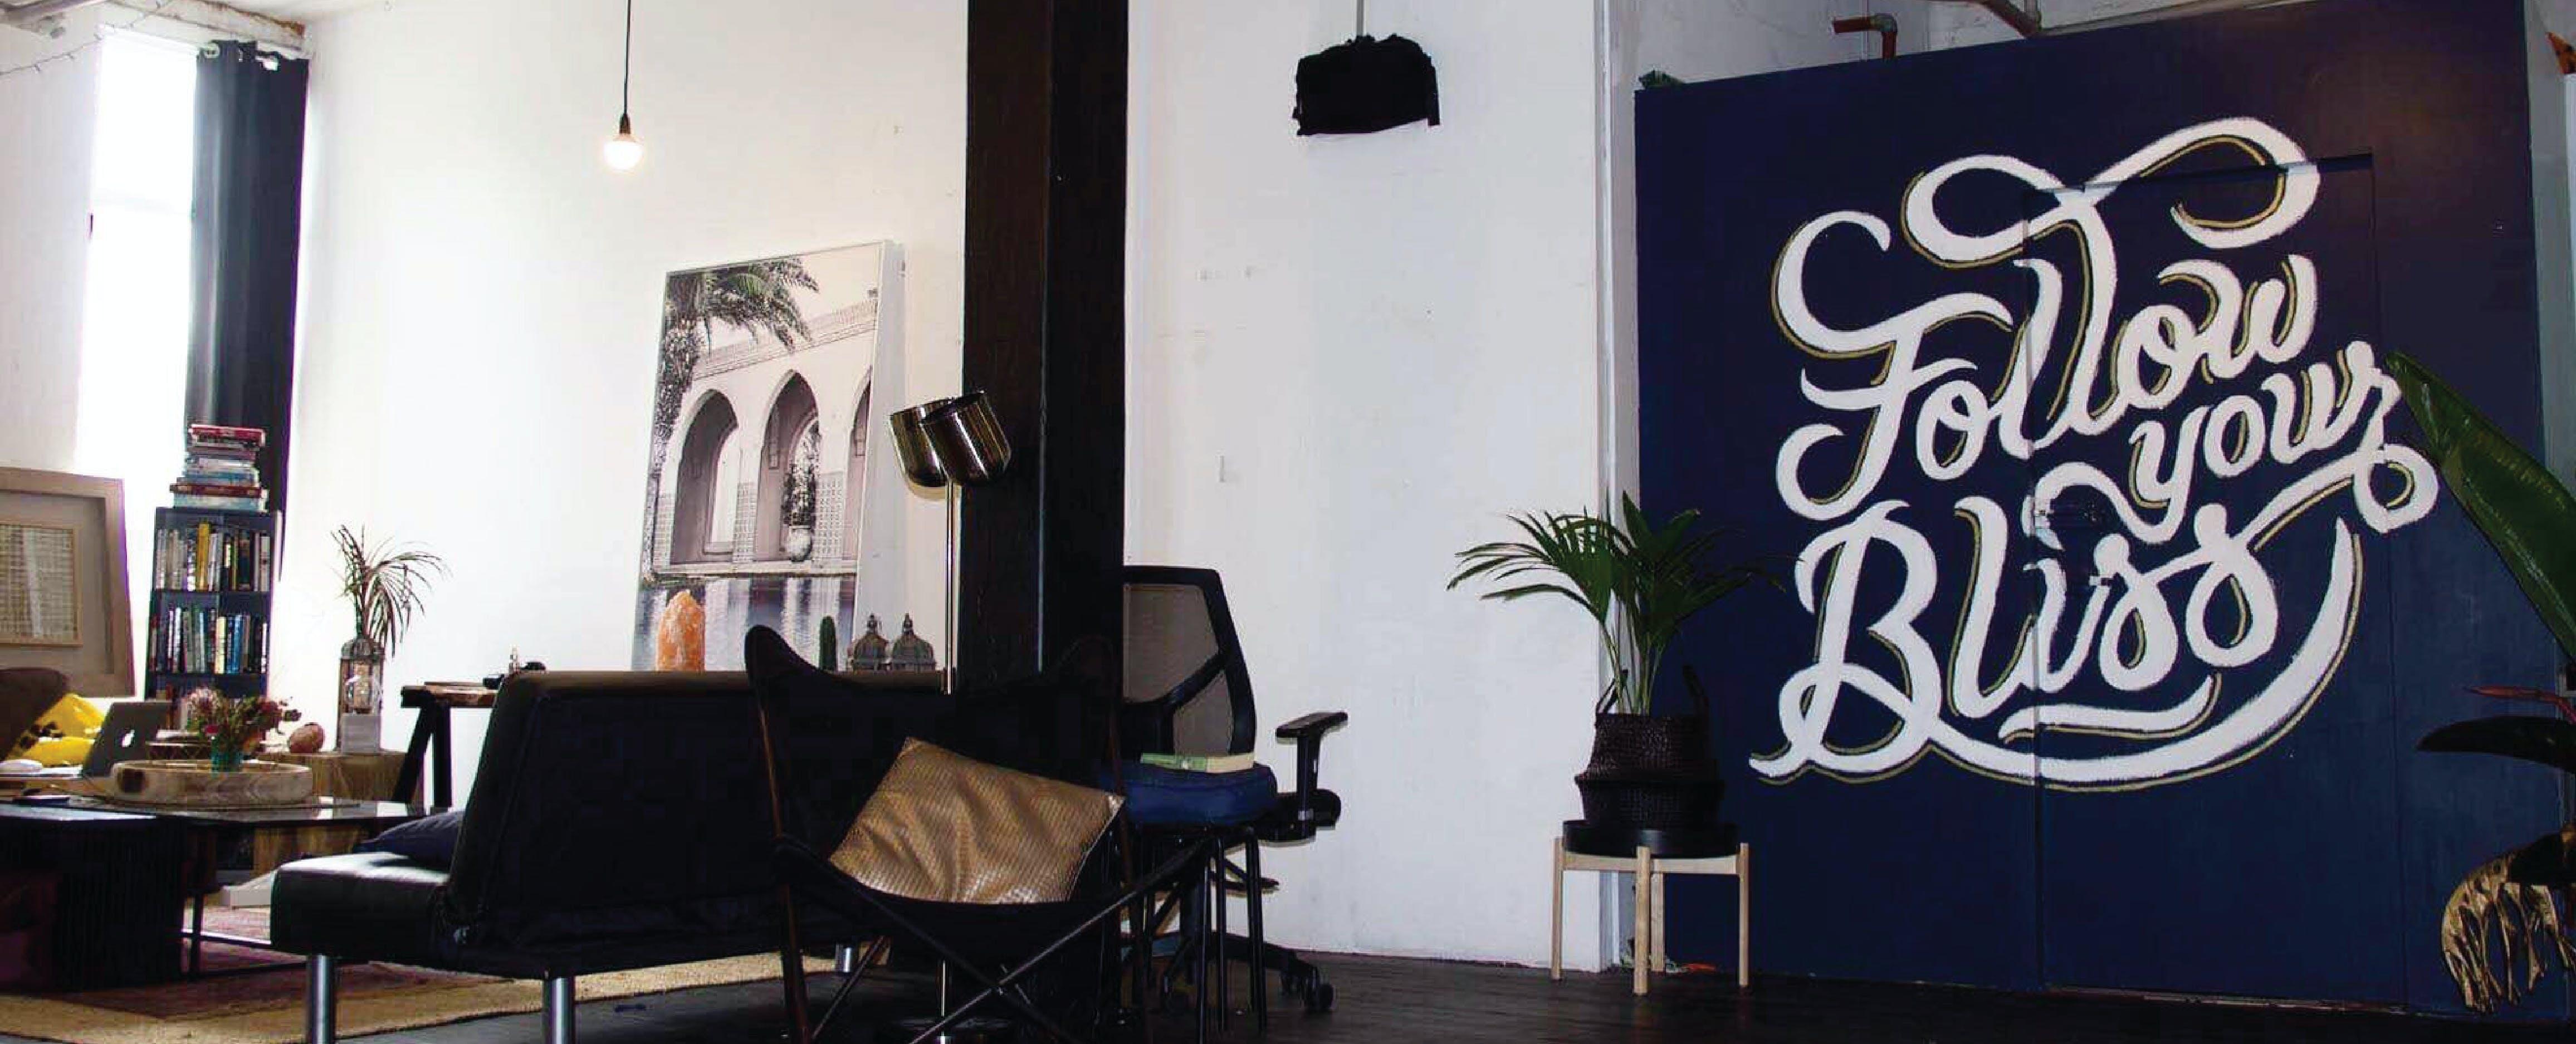 Events Space, multi-use area at Studio Blueprint, image 1